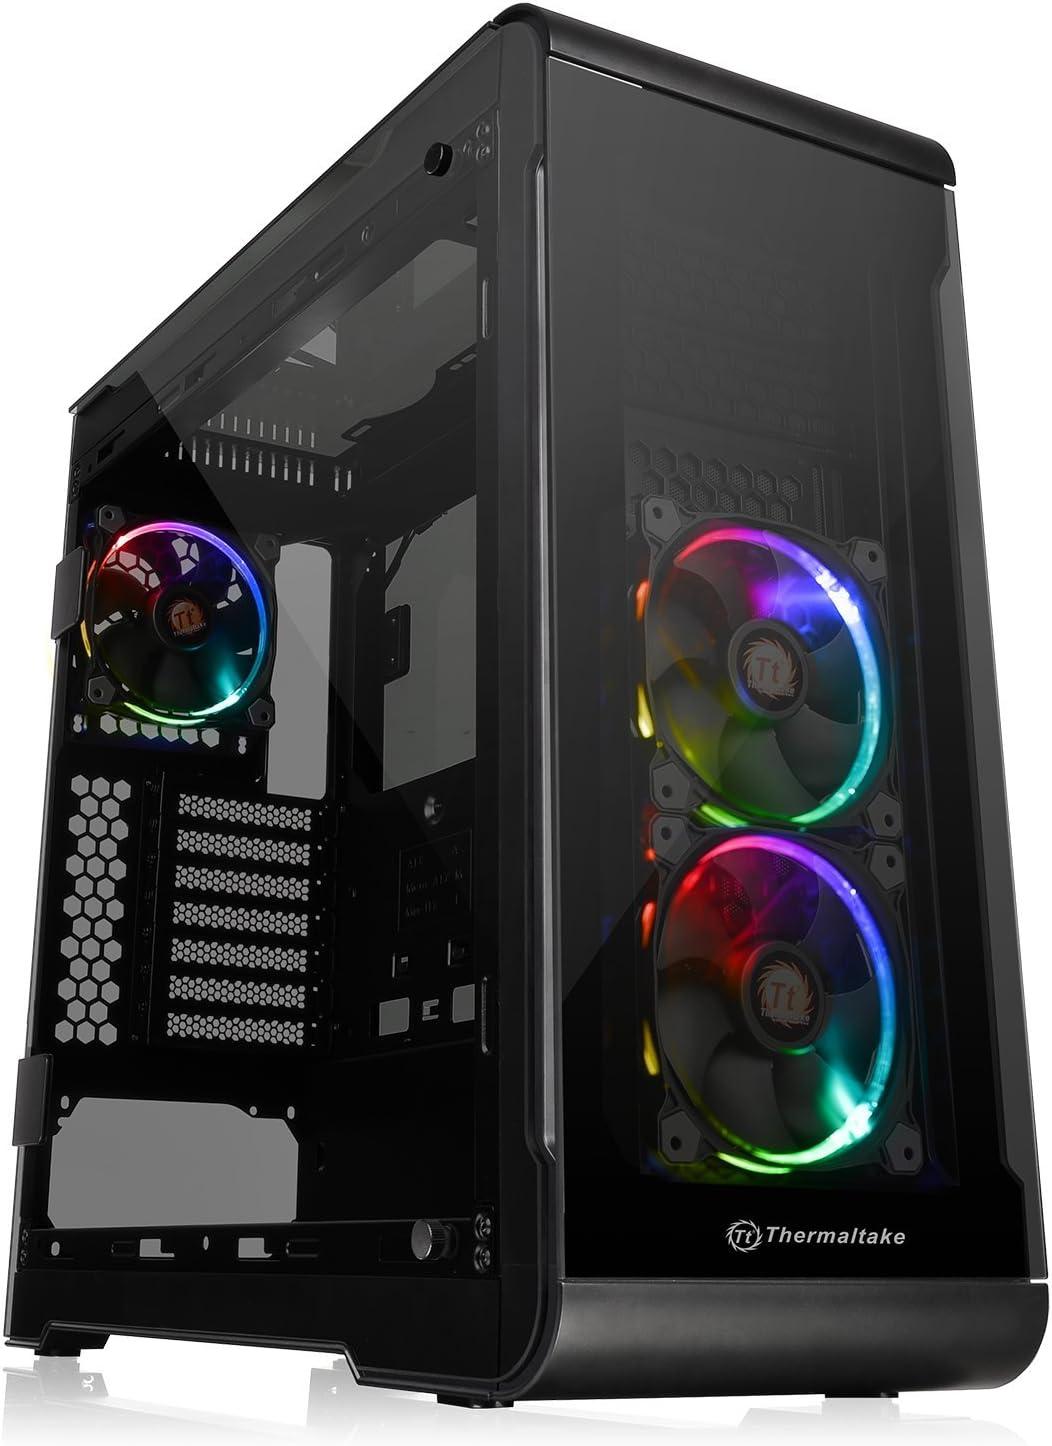 Thermaltake View 32 TG RGB - Carcasa de PC (Midi-Tower, E-ATX, Gaming, Modding, LCS) Color Negro: Amazon.es: Informática